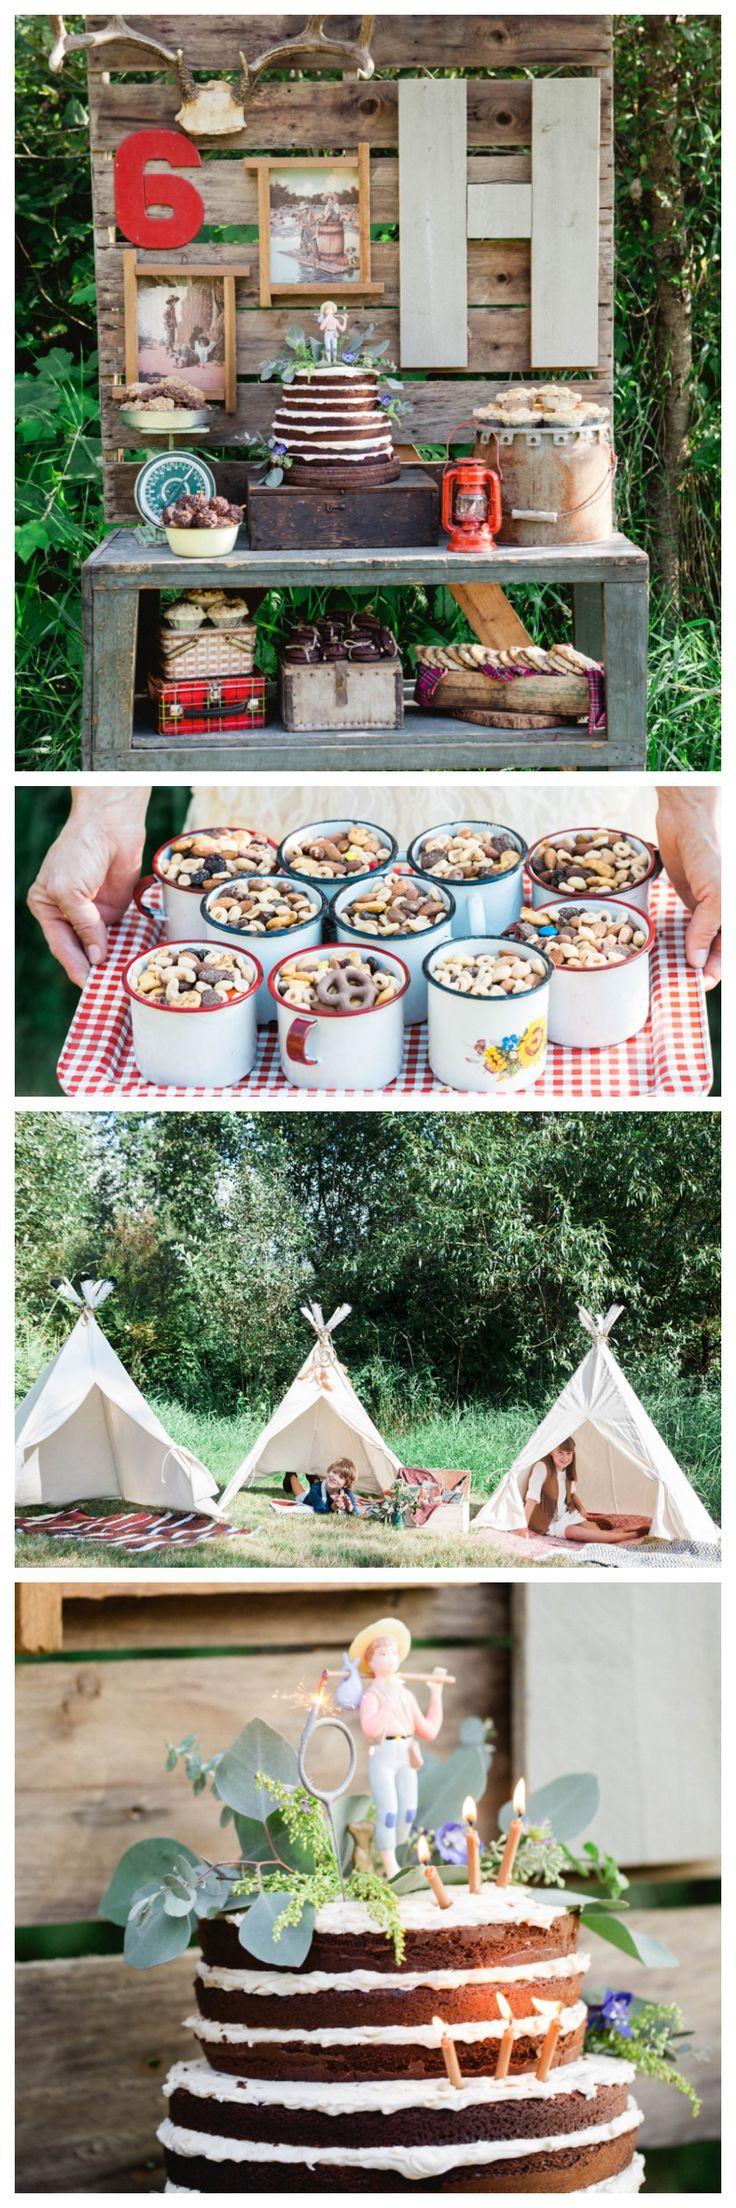 Ideas for an Adventure Themed Birthday Party - fab food, decor and cake ideas!